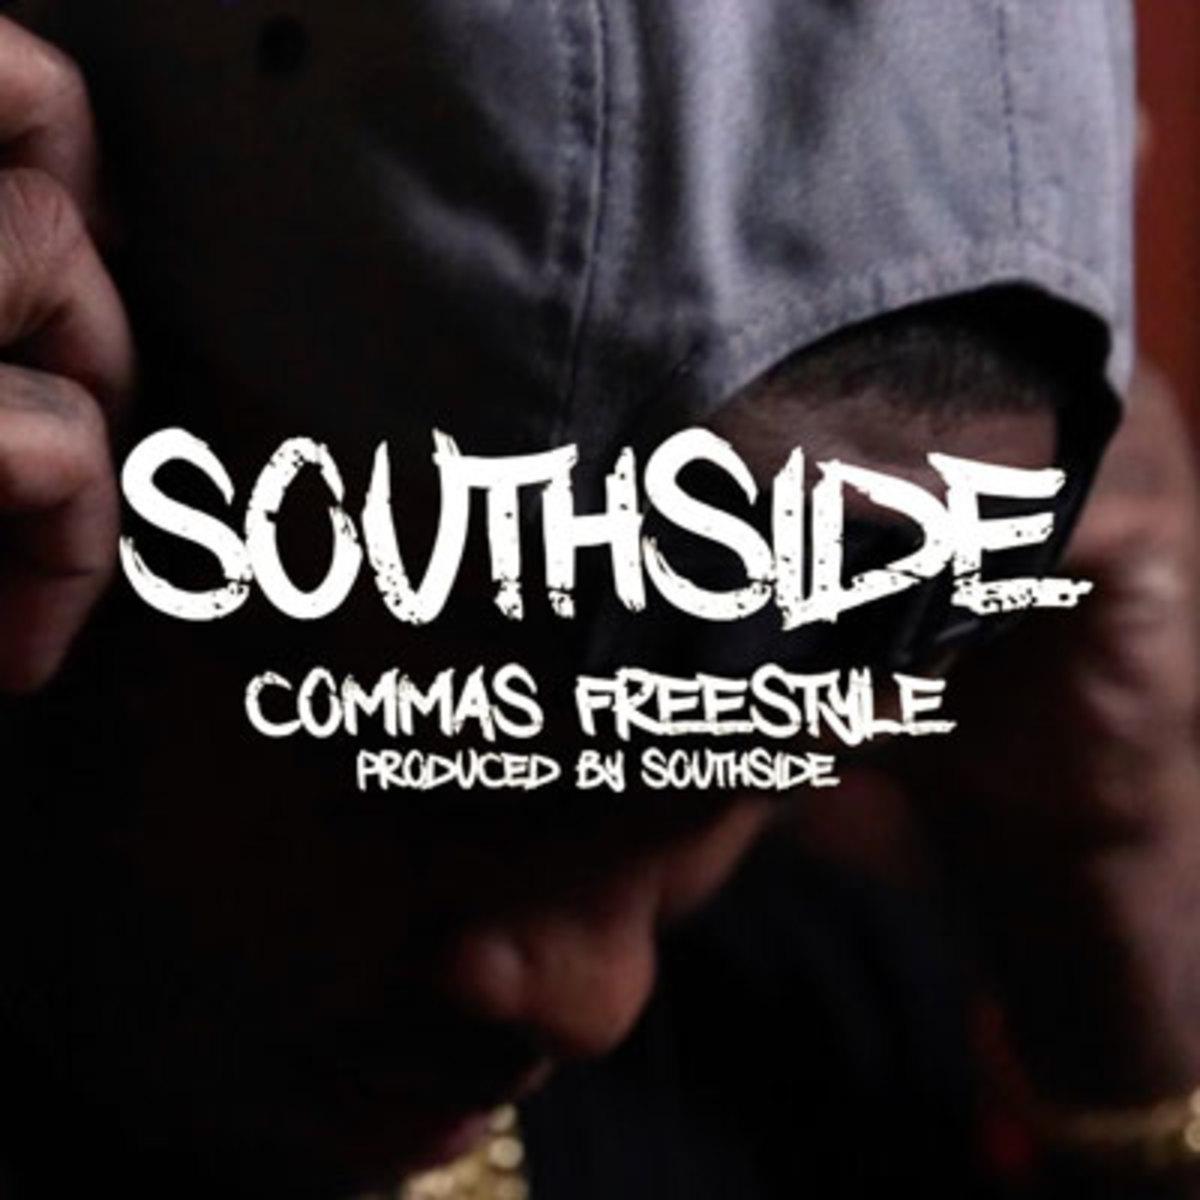 southside-commas-freestyle.jpg